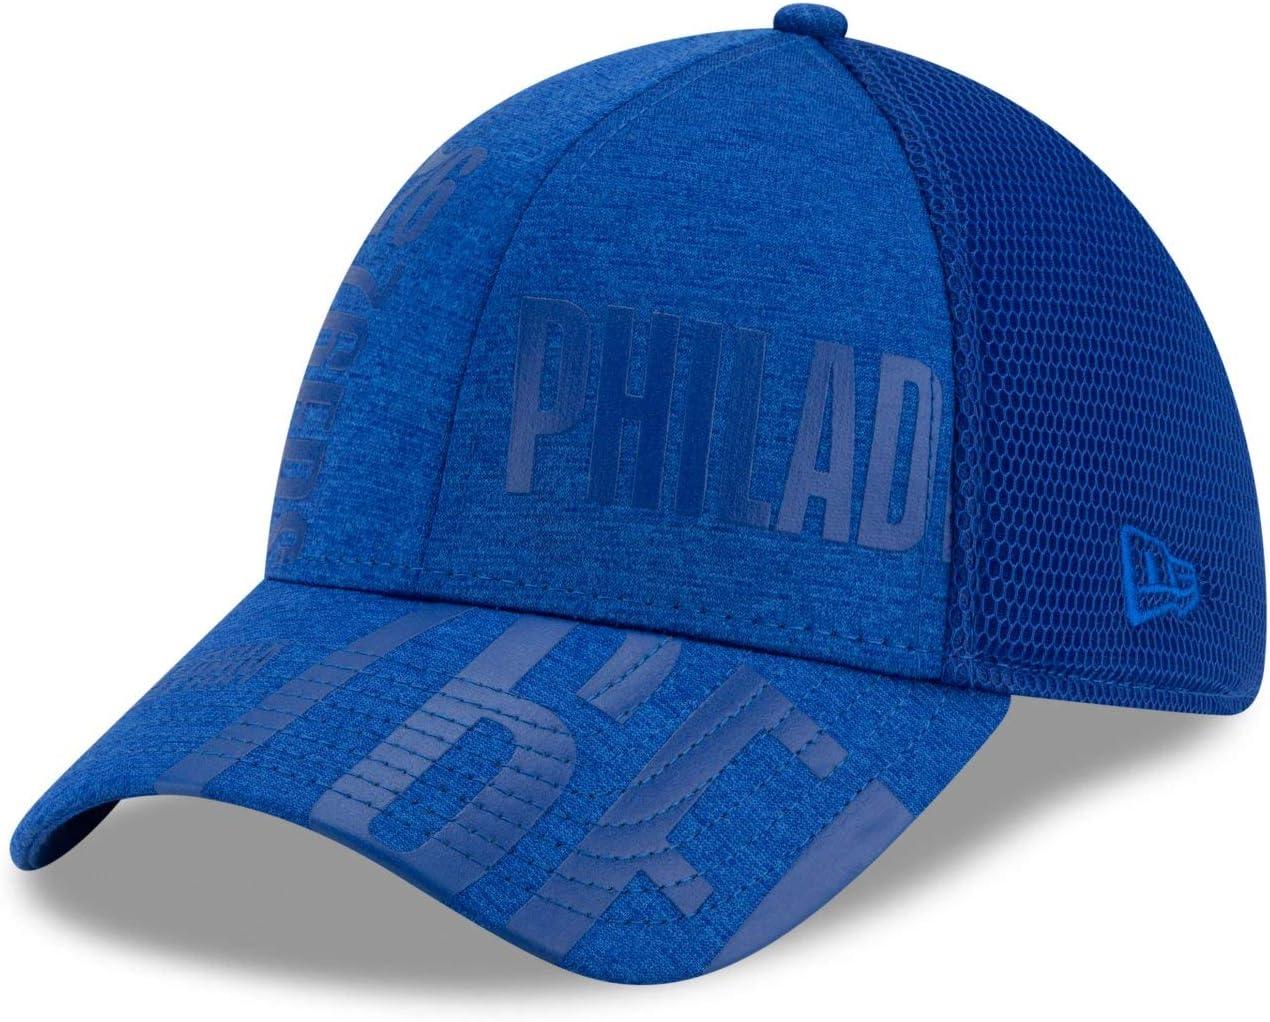 New Era 39Thirty Cap NBA TIP OFF Philadelphia 76ers royal